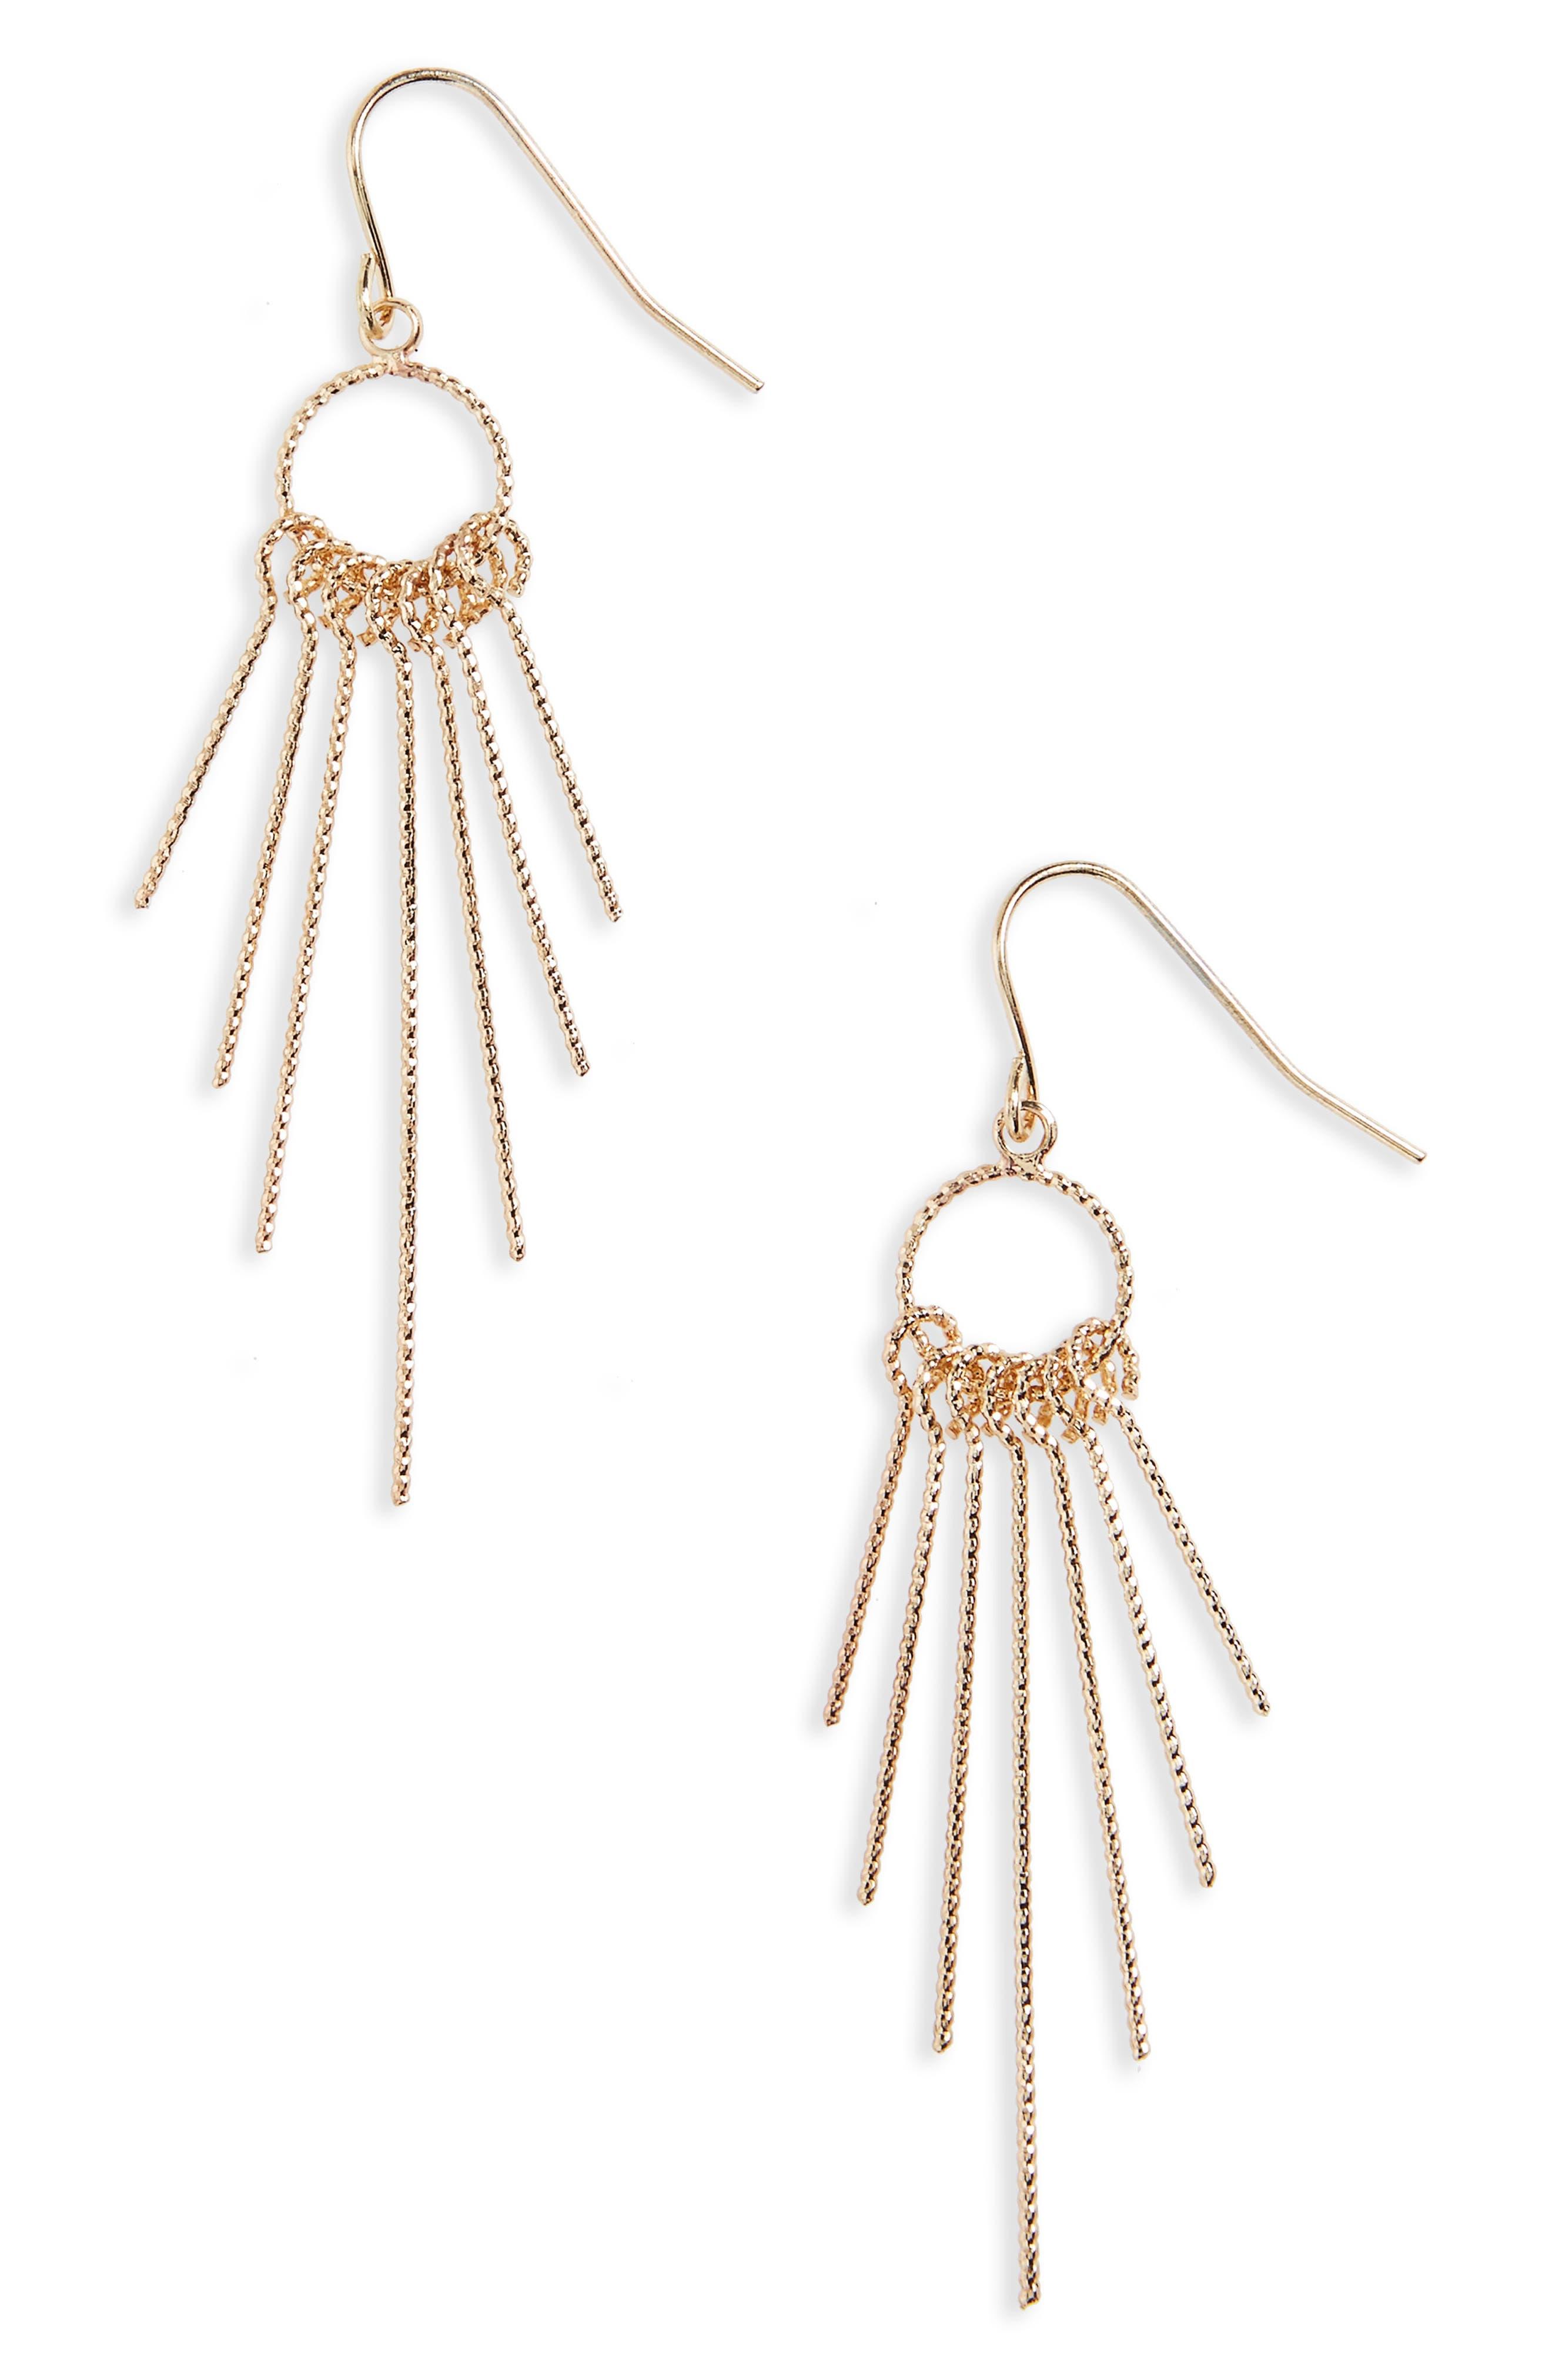 Natasha Gold Sticks Drop Earrings